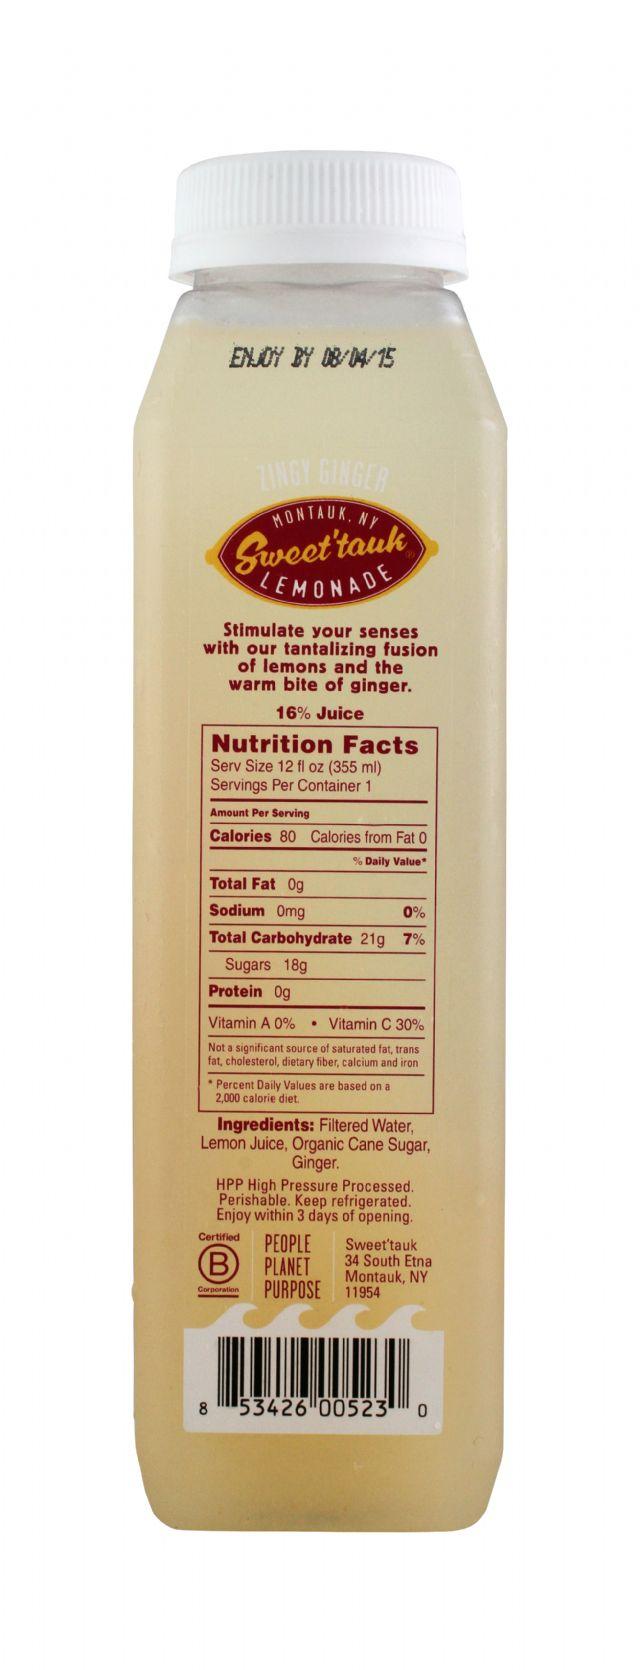 Sweet'tauk Lemonade: SweetTaulk ZingyGinger Facts